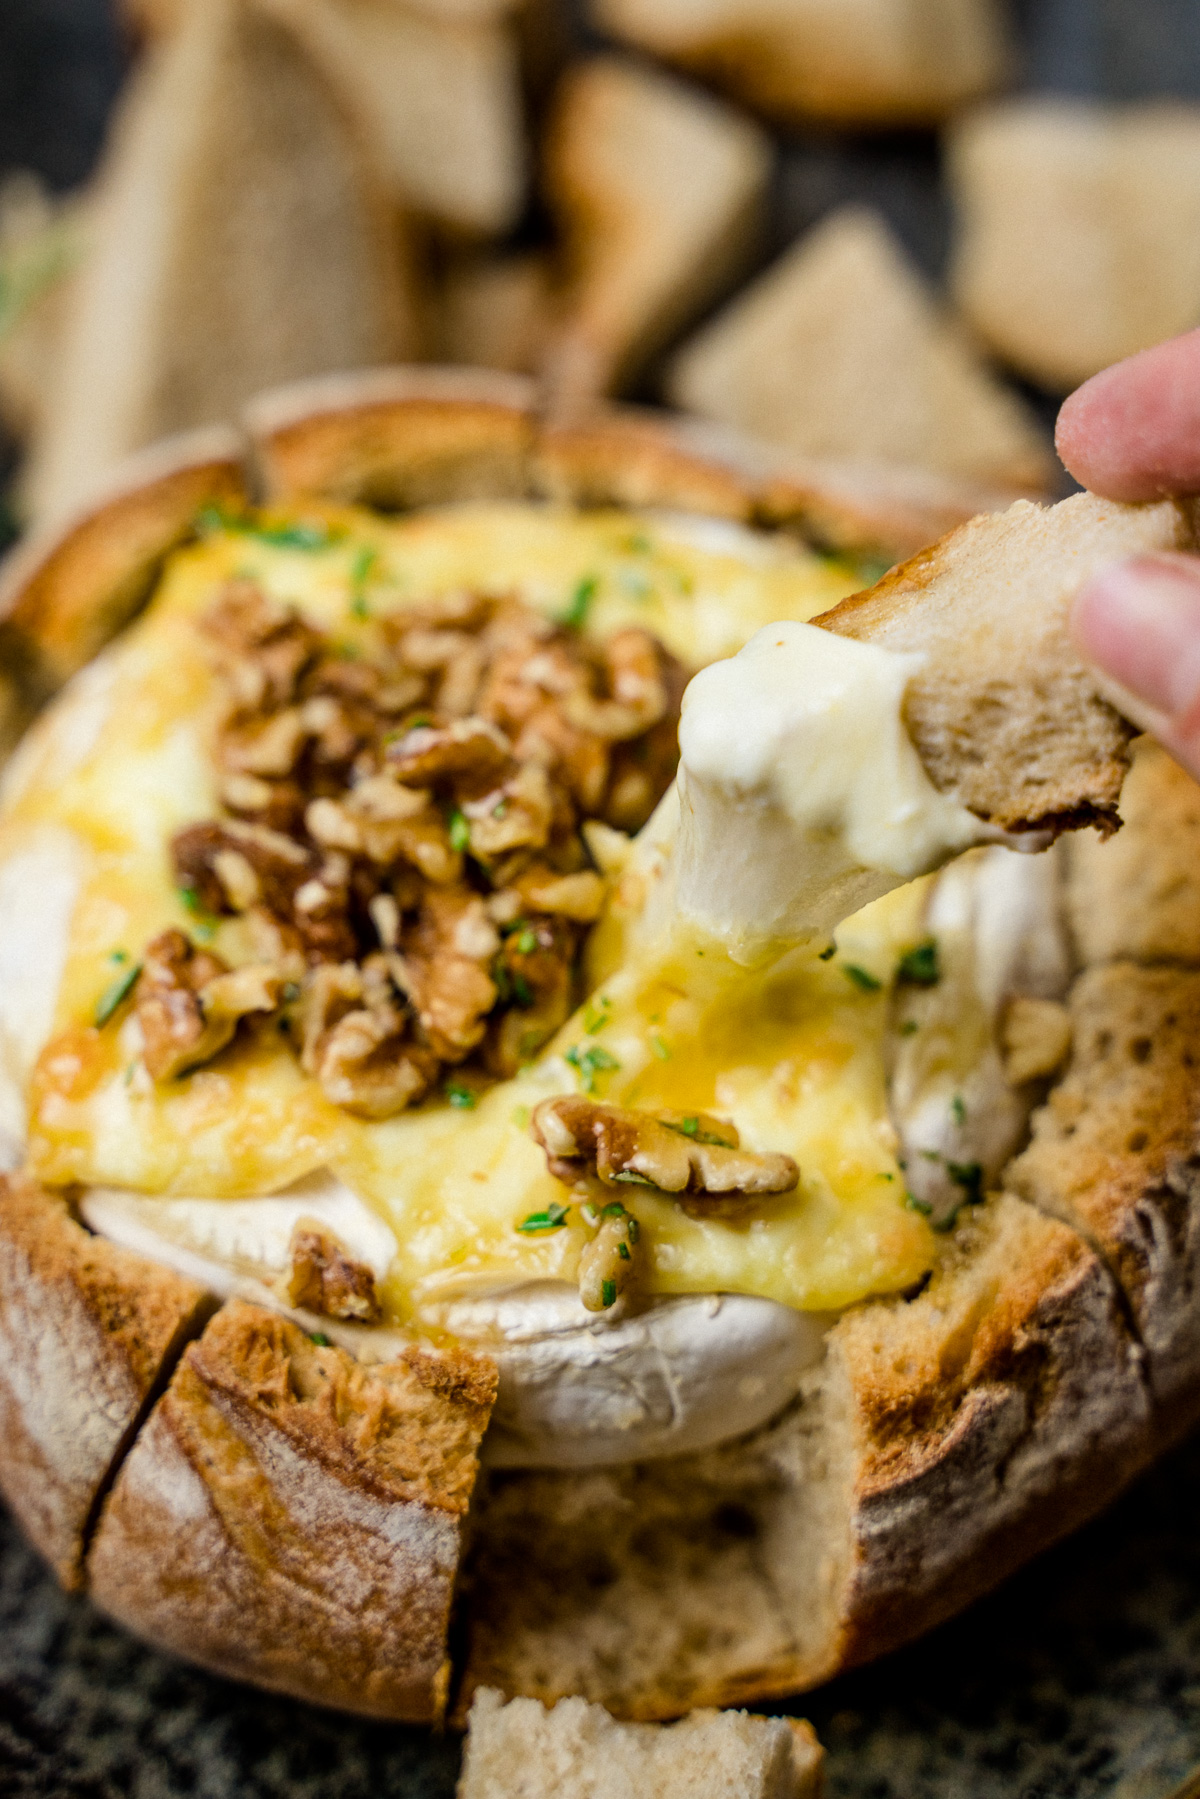 Gebackener Camembert im Brot mit Honig und Walnüssen - kuechenchaotin.de